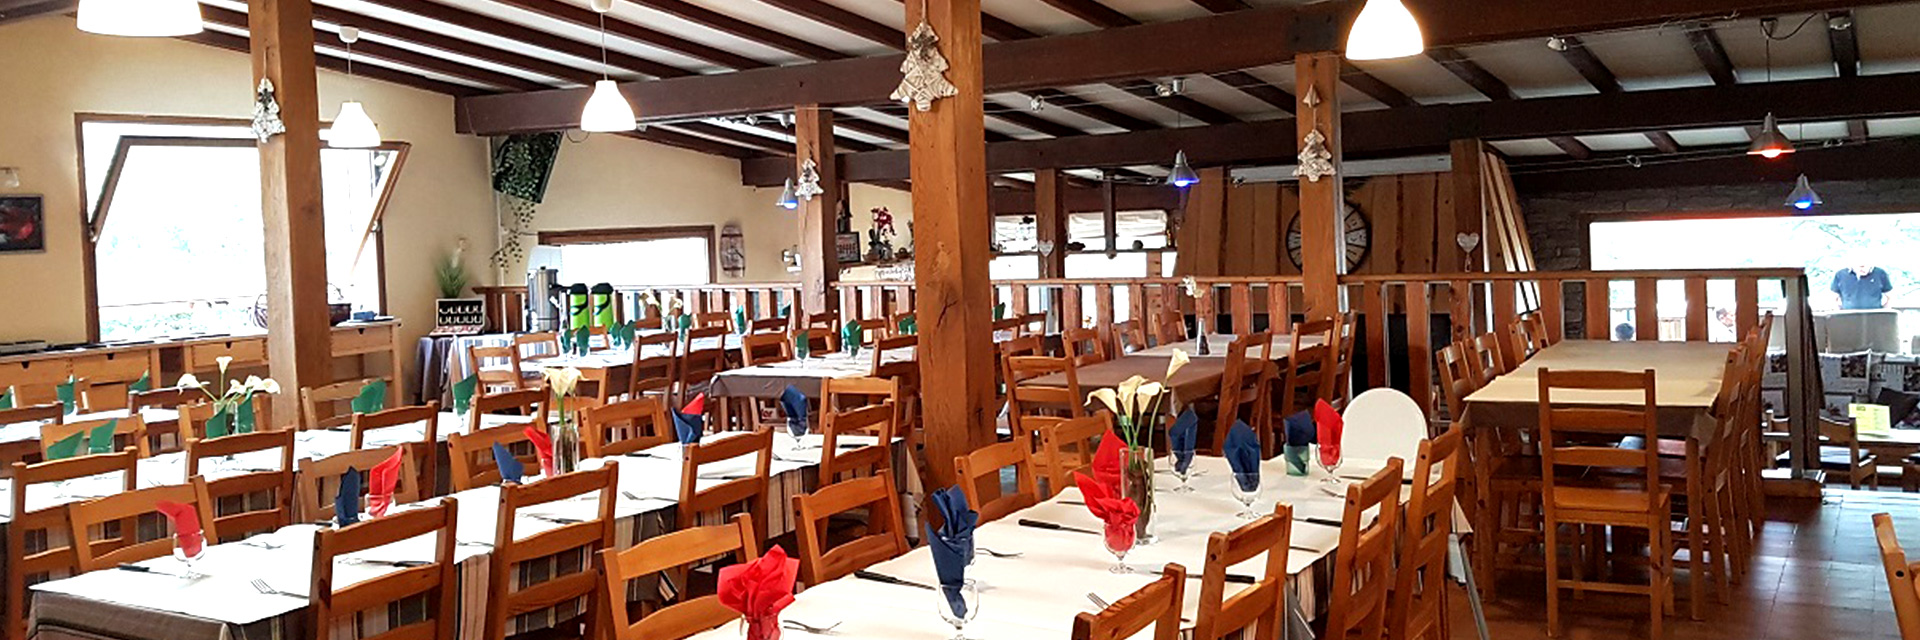 village-vacances-azur-et-neige-salle-restauration-collective